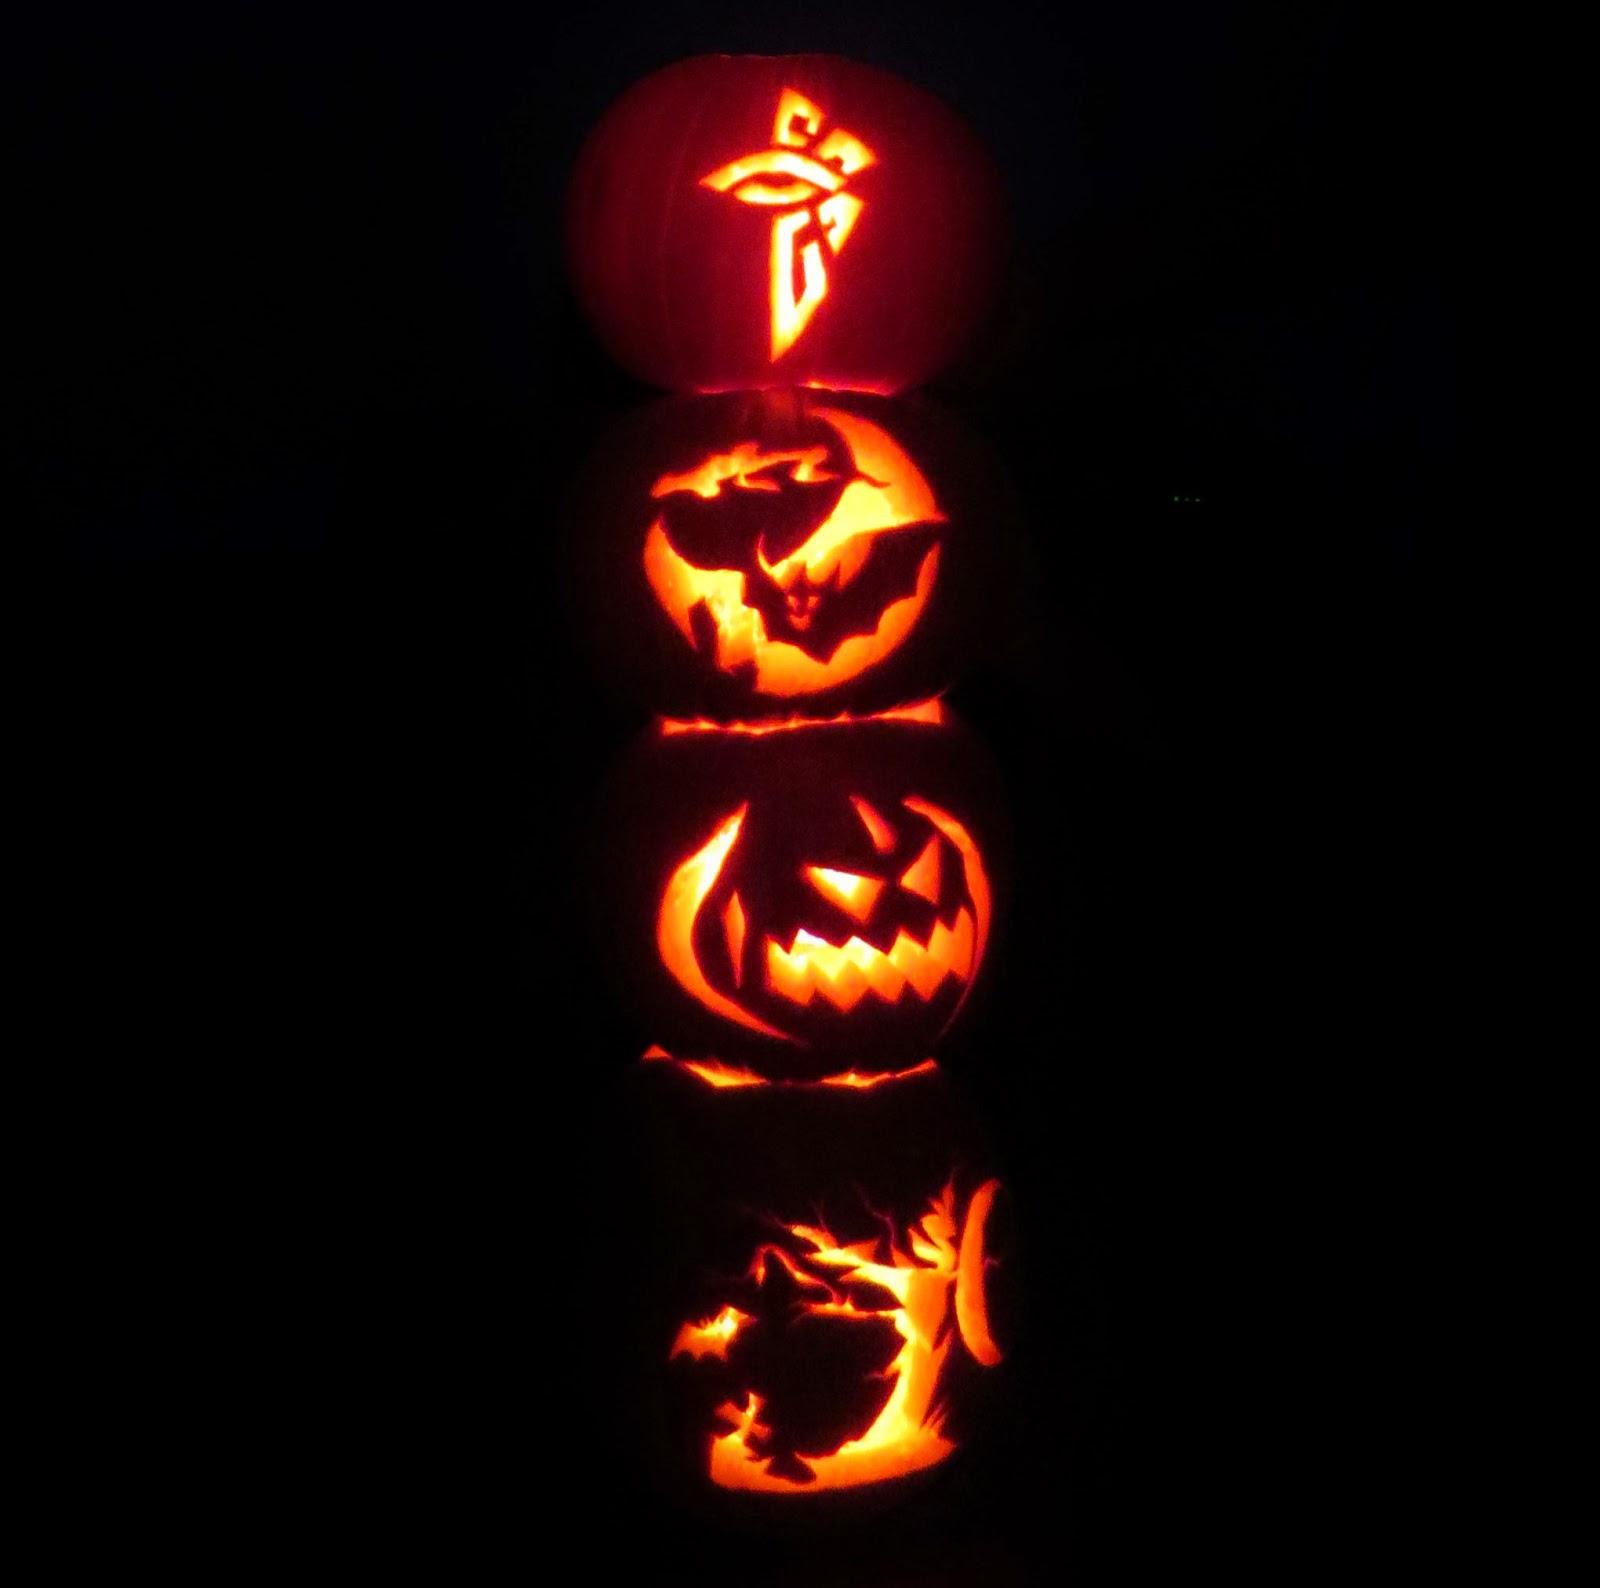 Pumpkin, pumpkin carving, pumpkin carving ideas, halloween, jack o lantern, spooky, scary, pumpkin lights